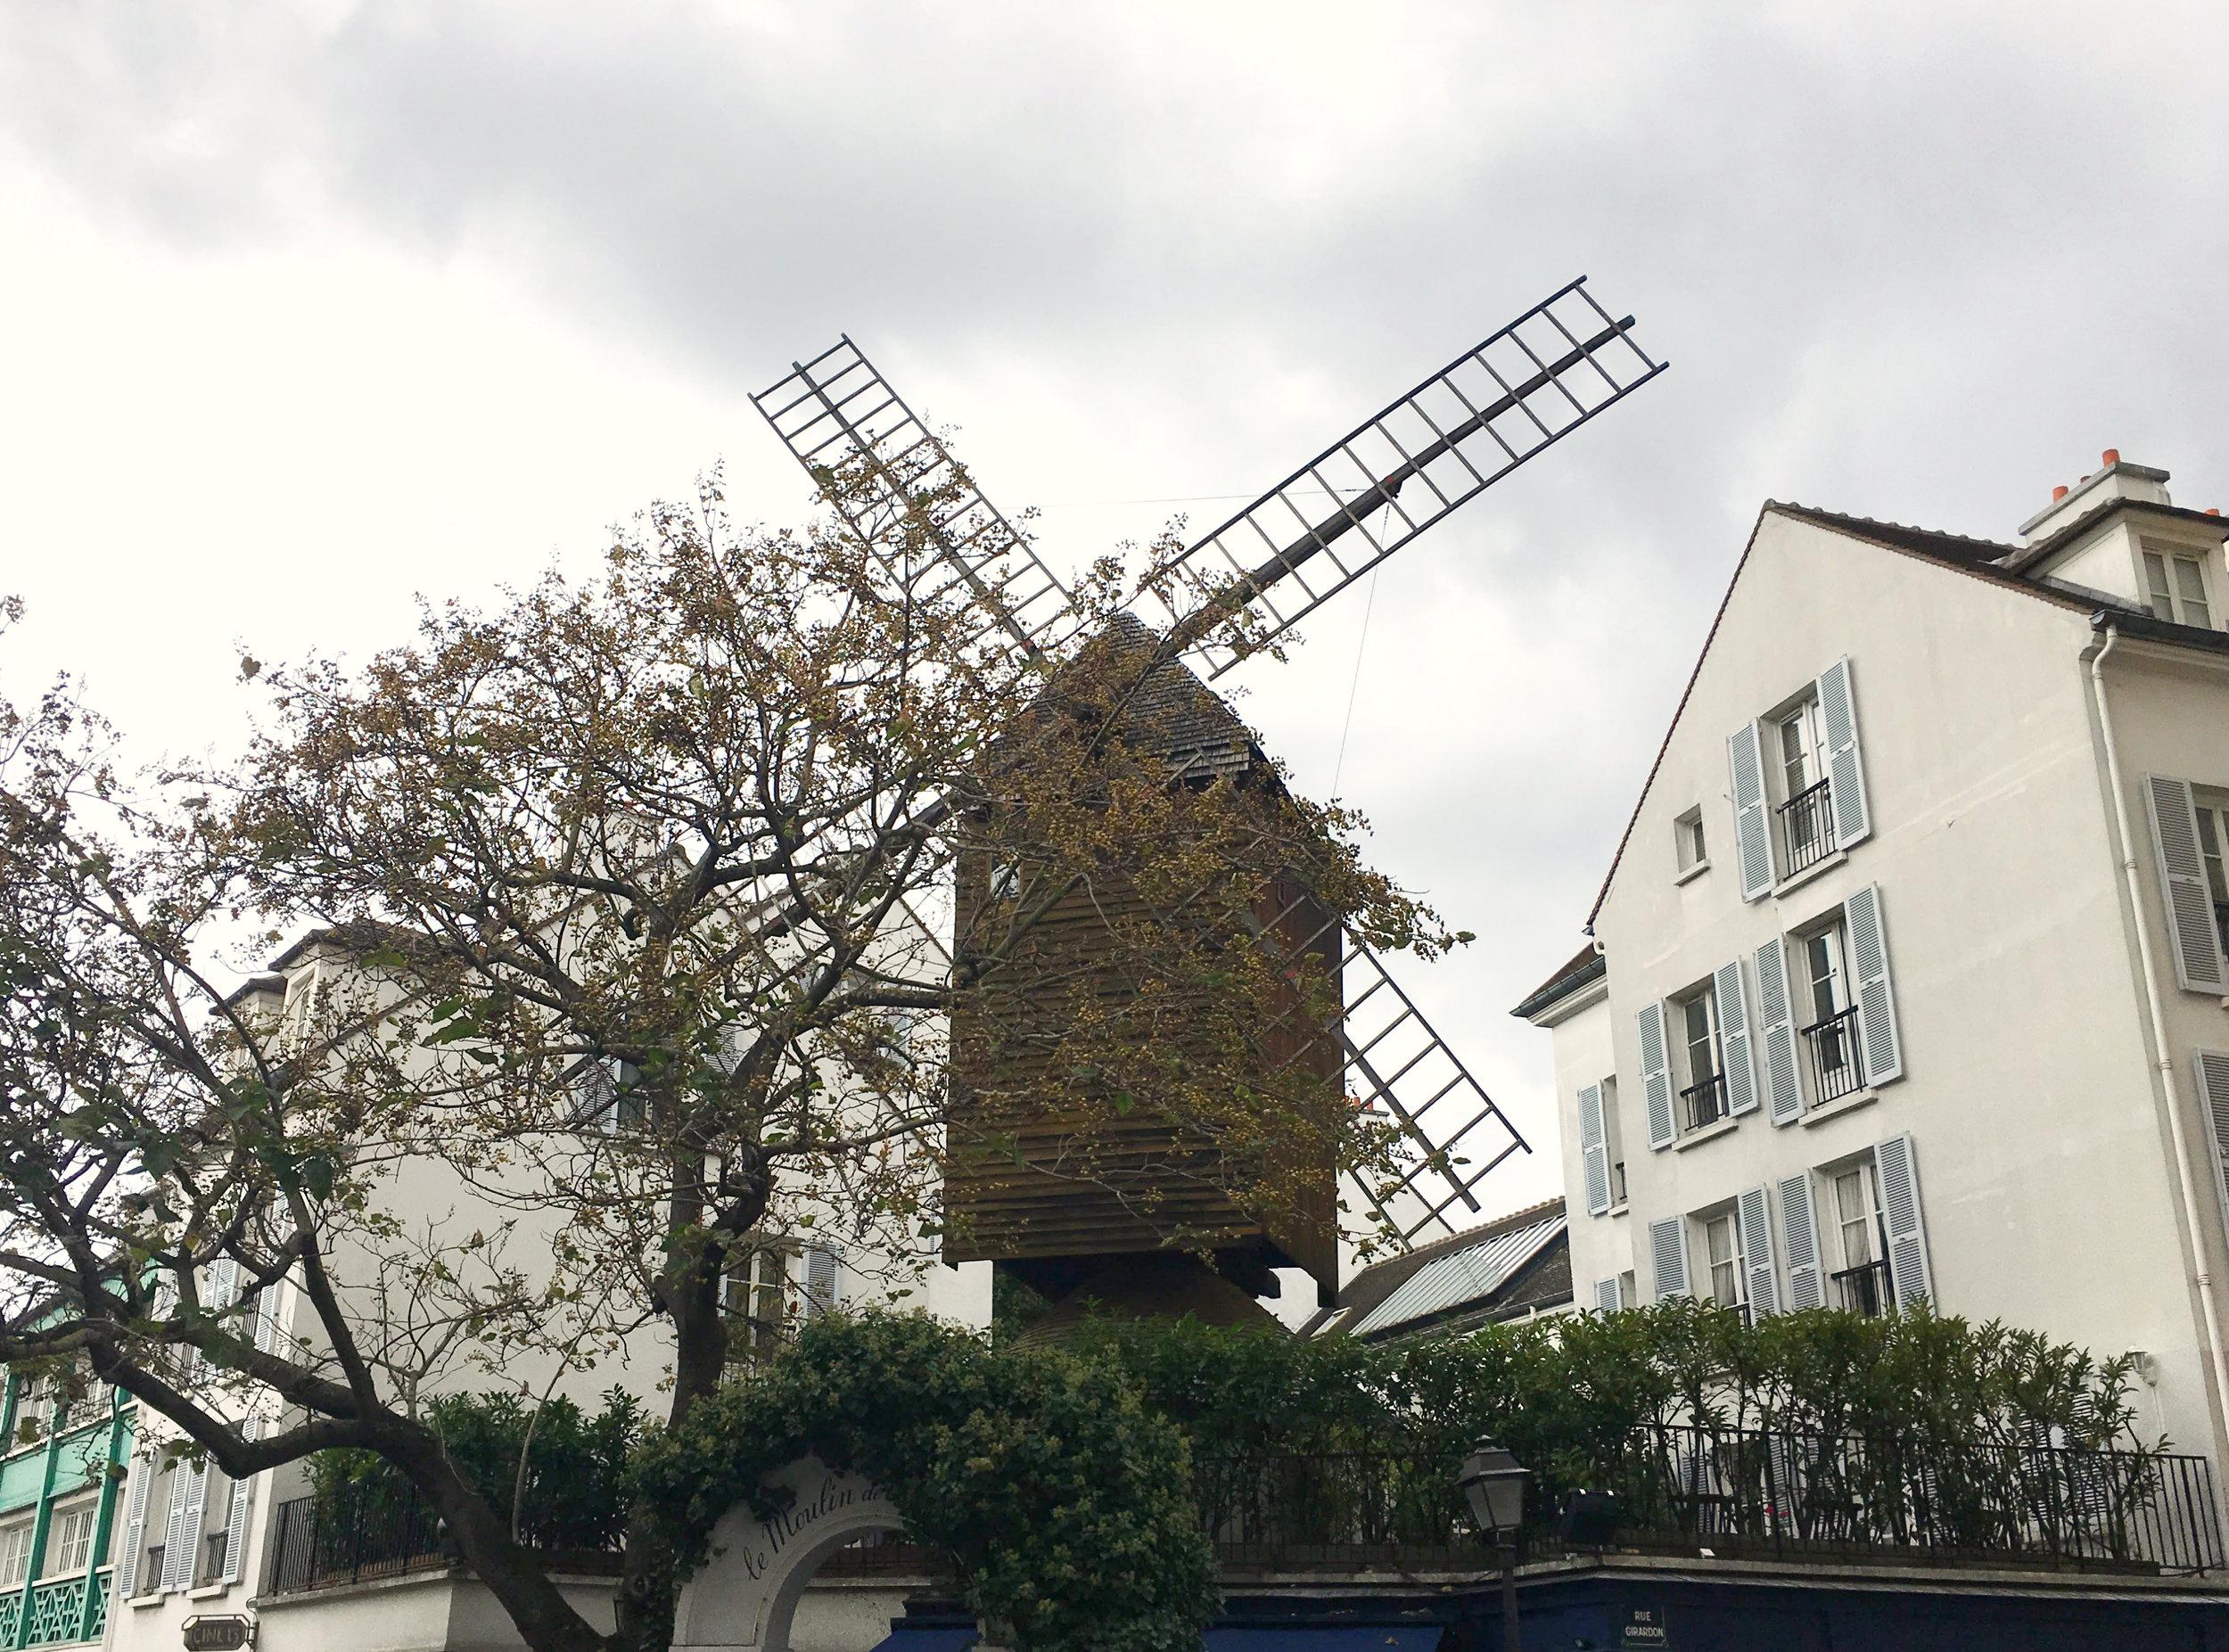 montmartre moulin visite guidee paris.jpg